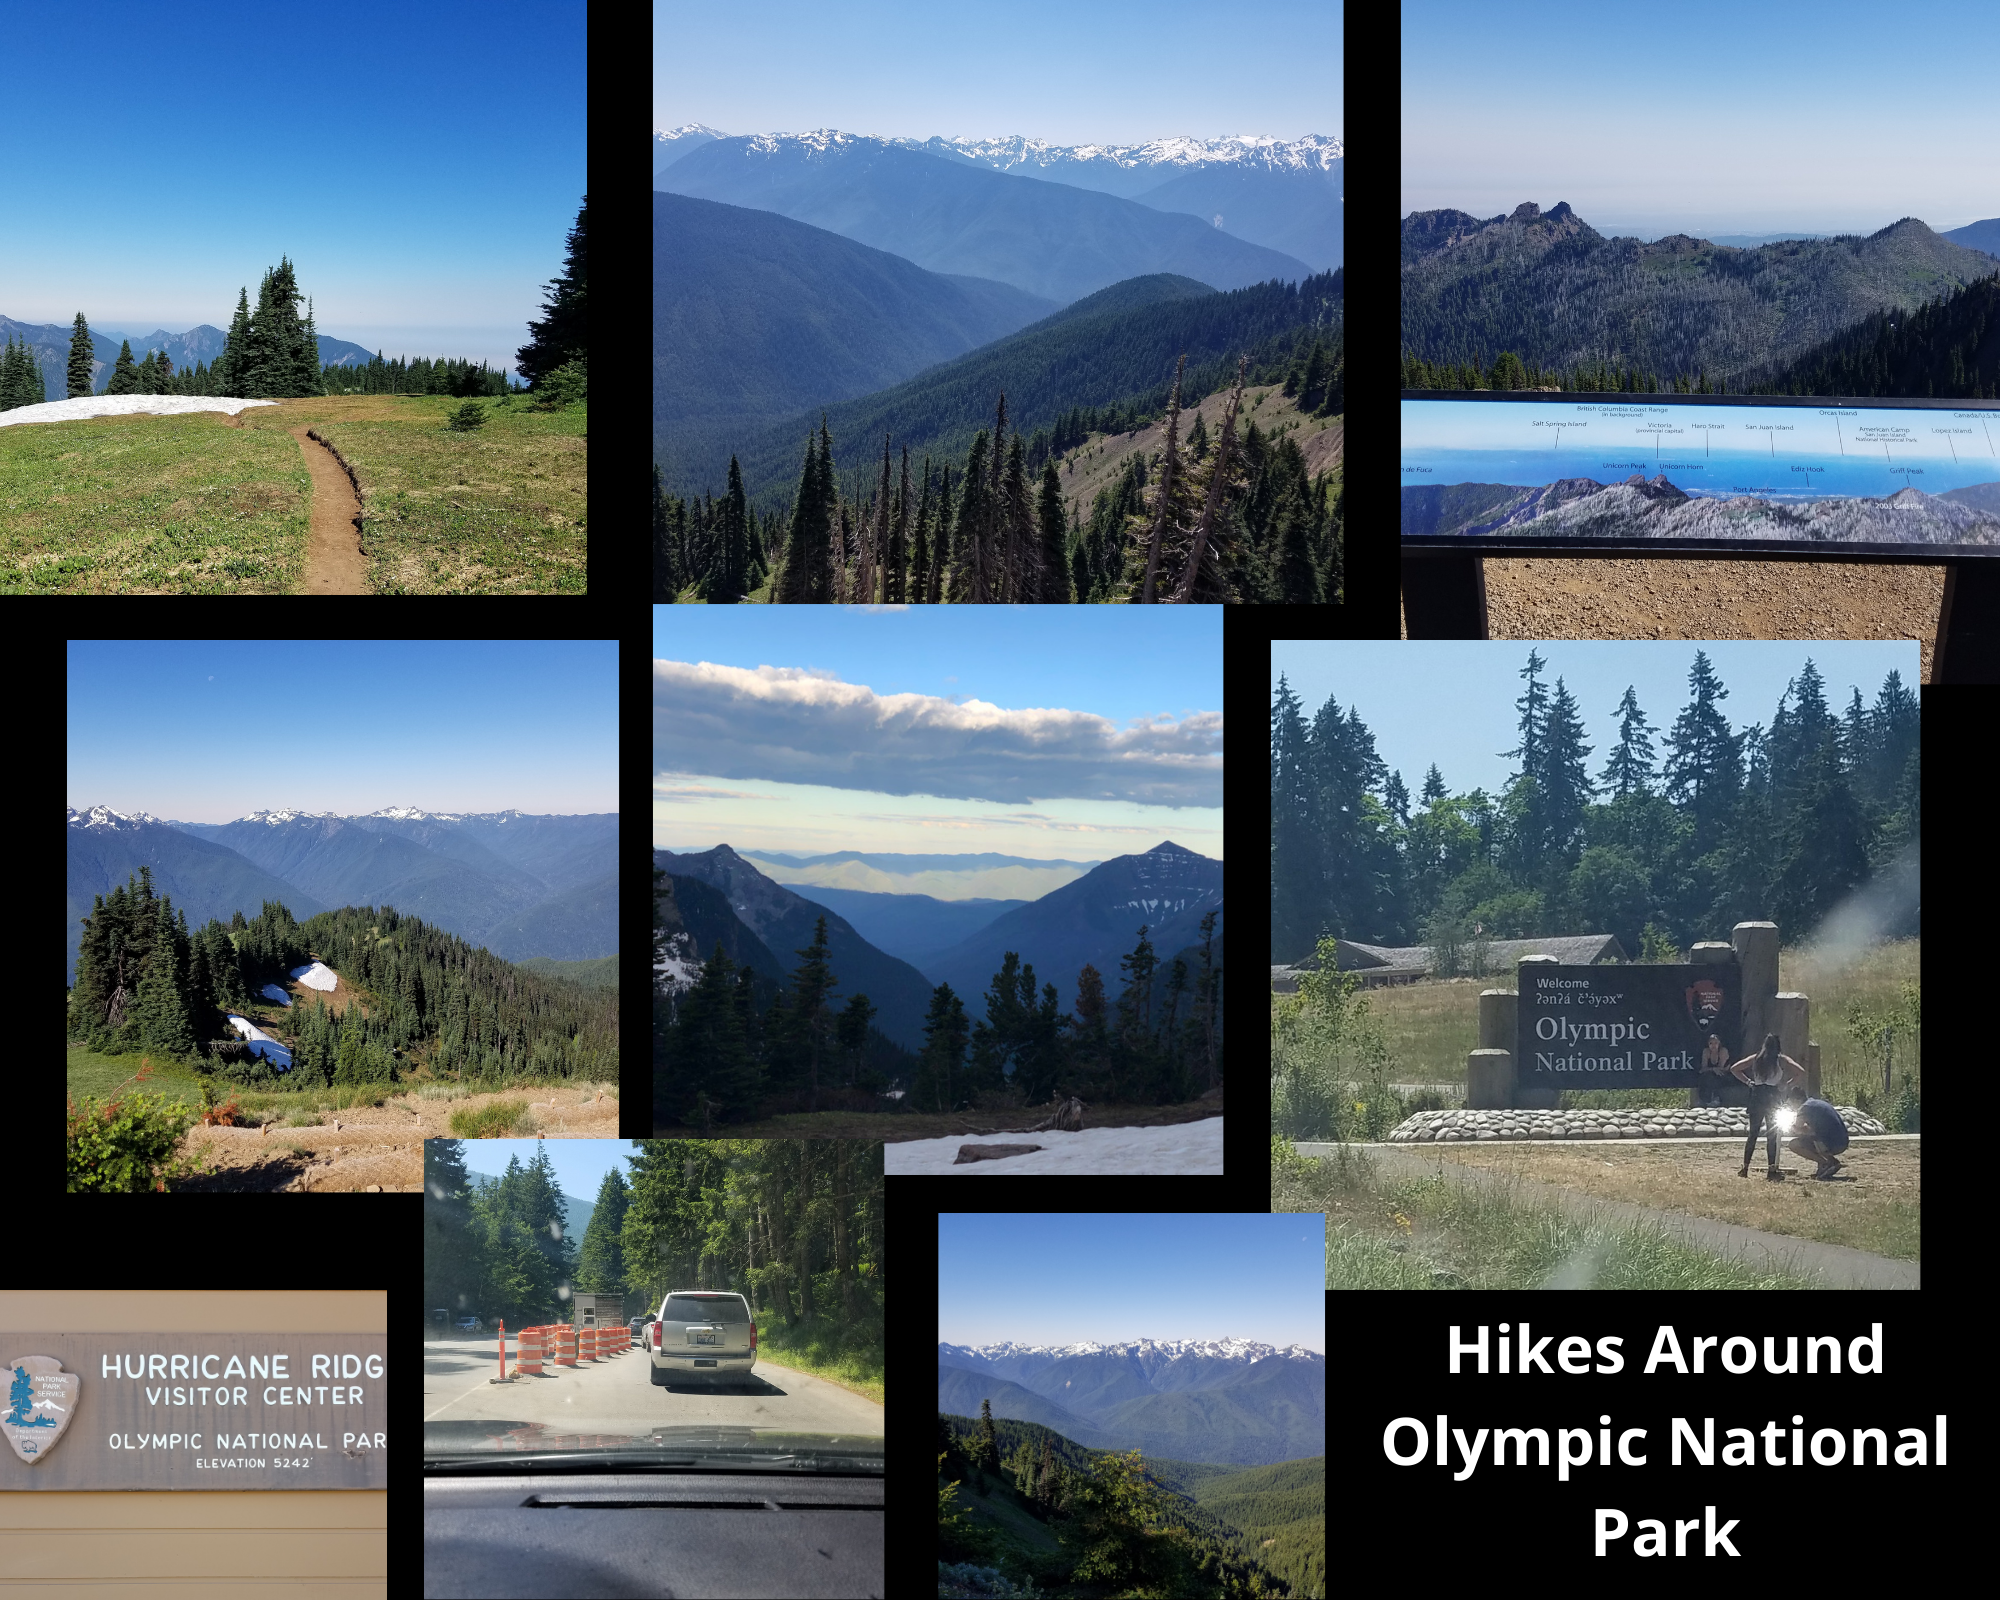 Hikes-around-olympic-national-park